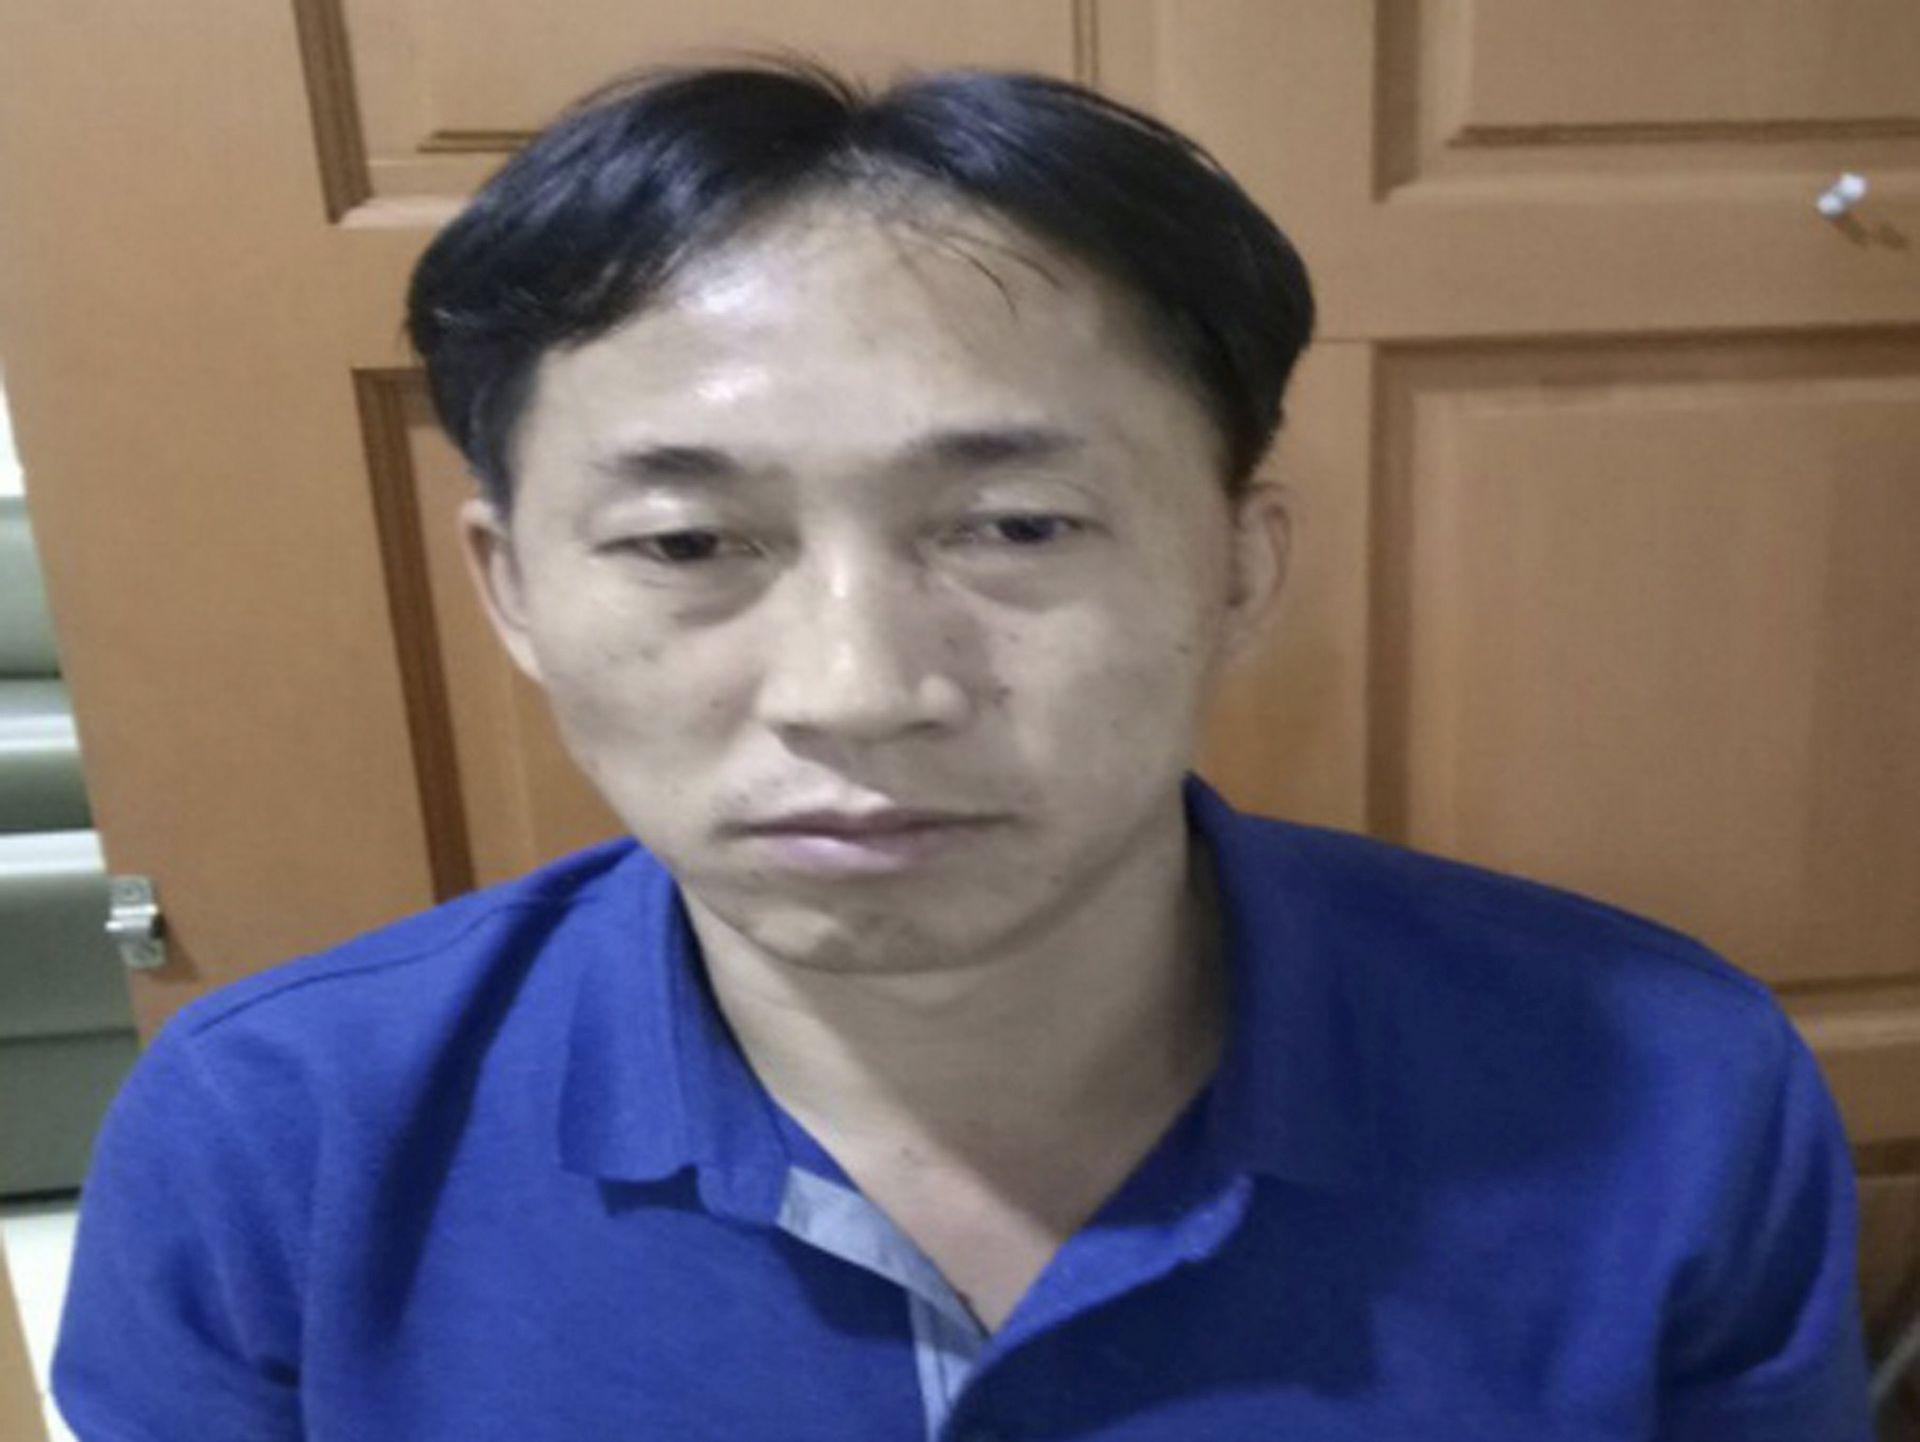 Sjevernokorejac osumnjičen za ubojstvo Kim Jong-nama sutra na slobodi, Malezija uvodi vize